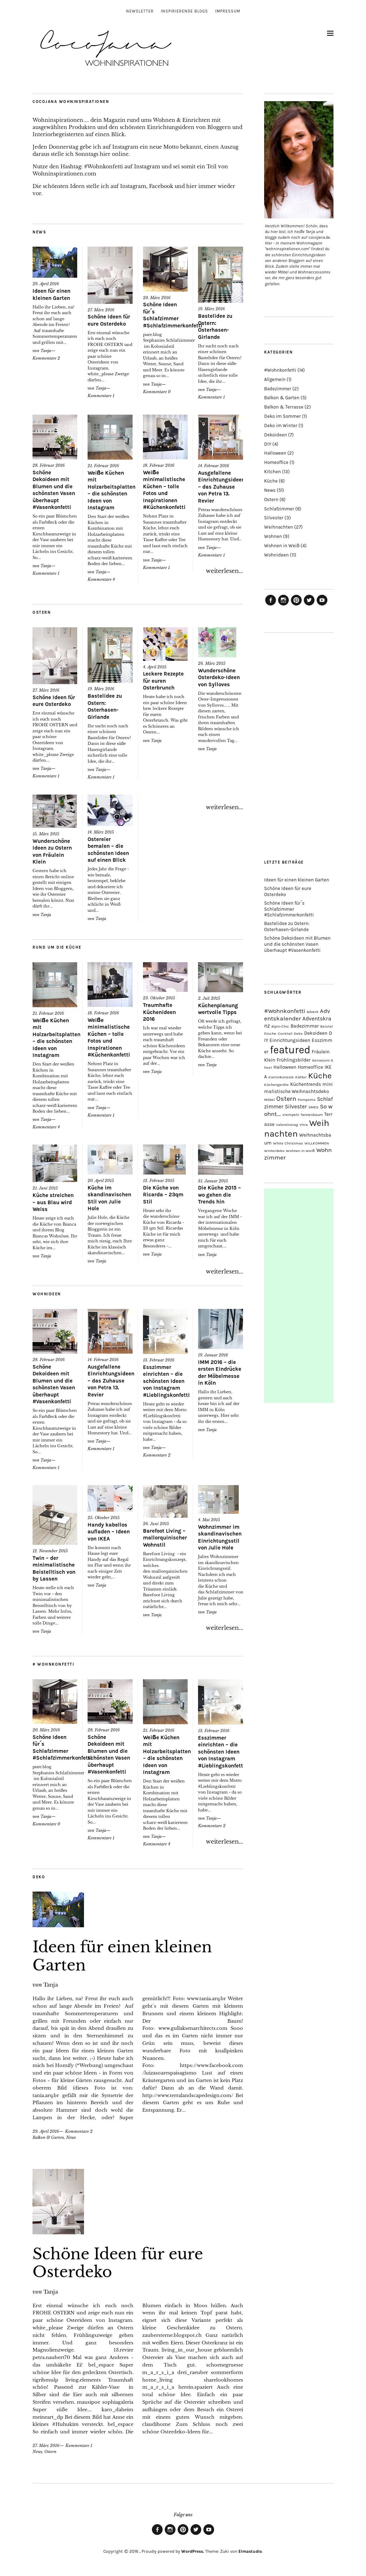 Cocojana Competitors, Revenue and Employees - Owler Company Profile